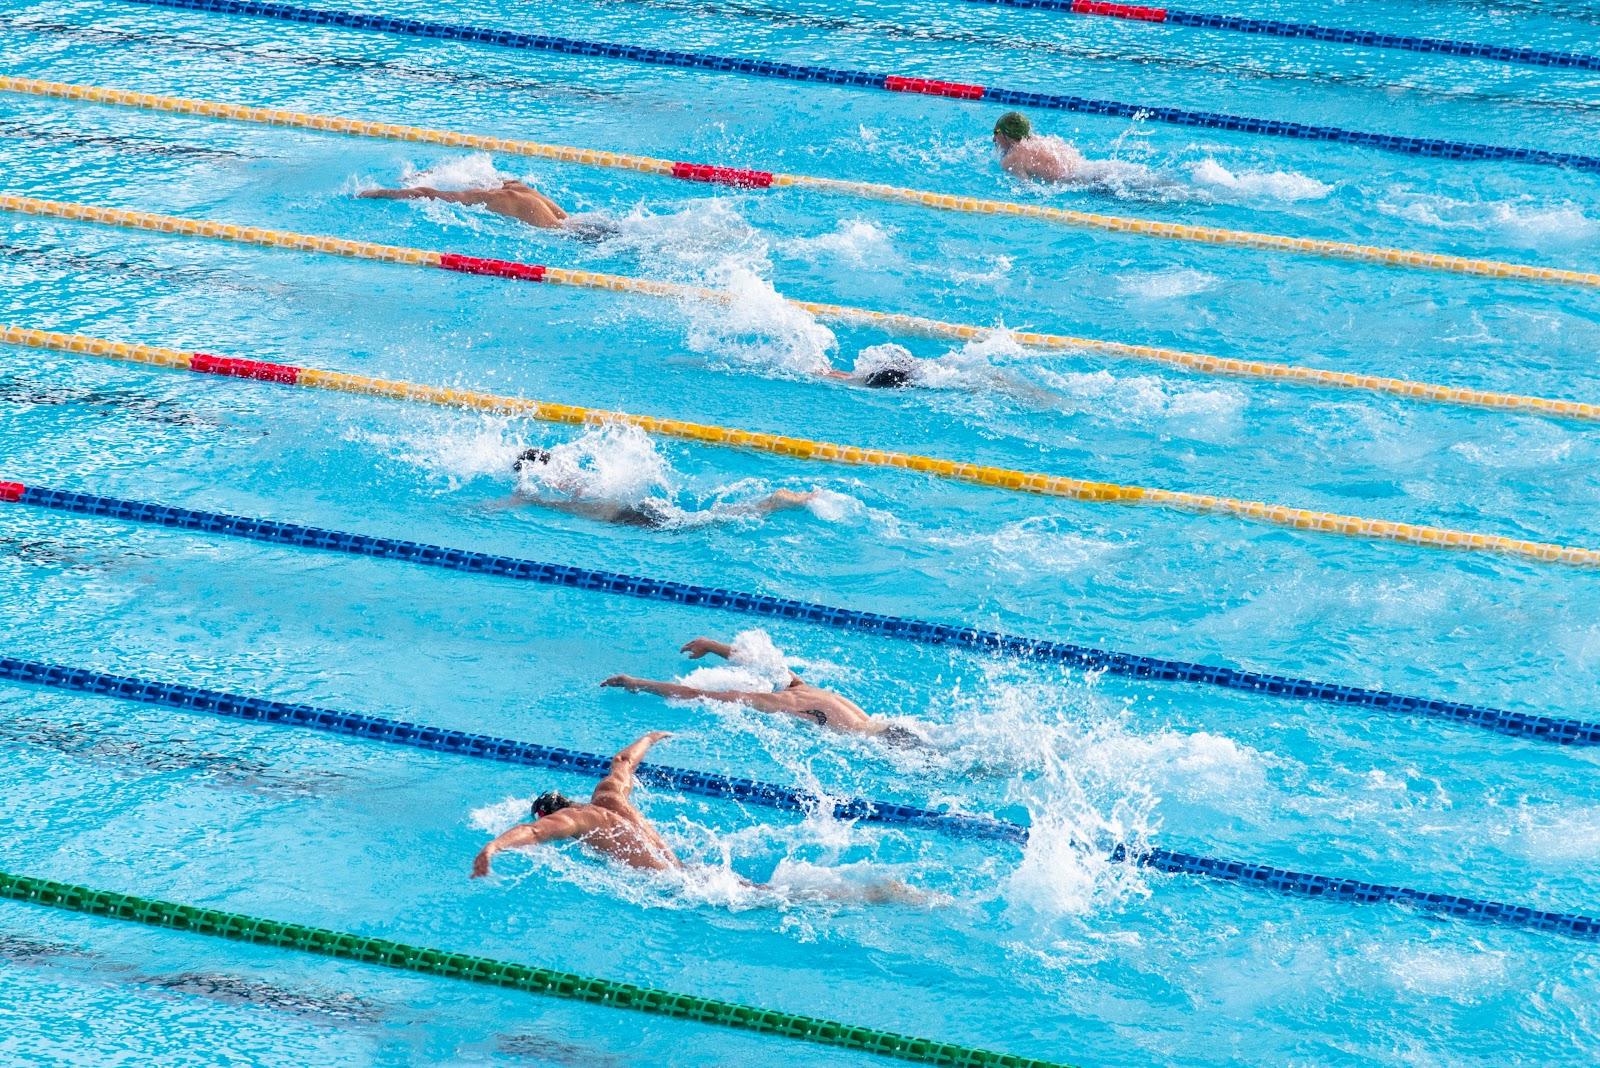 Easy access helps in increasing membership at swimming pools